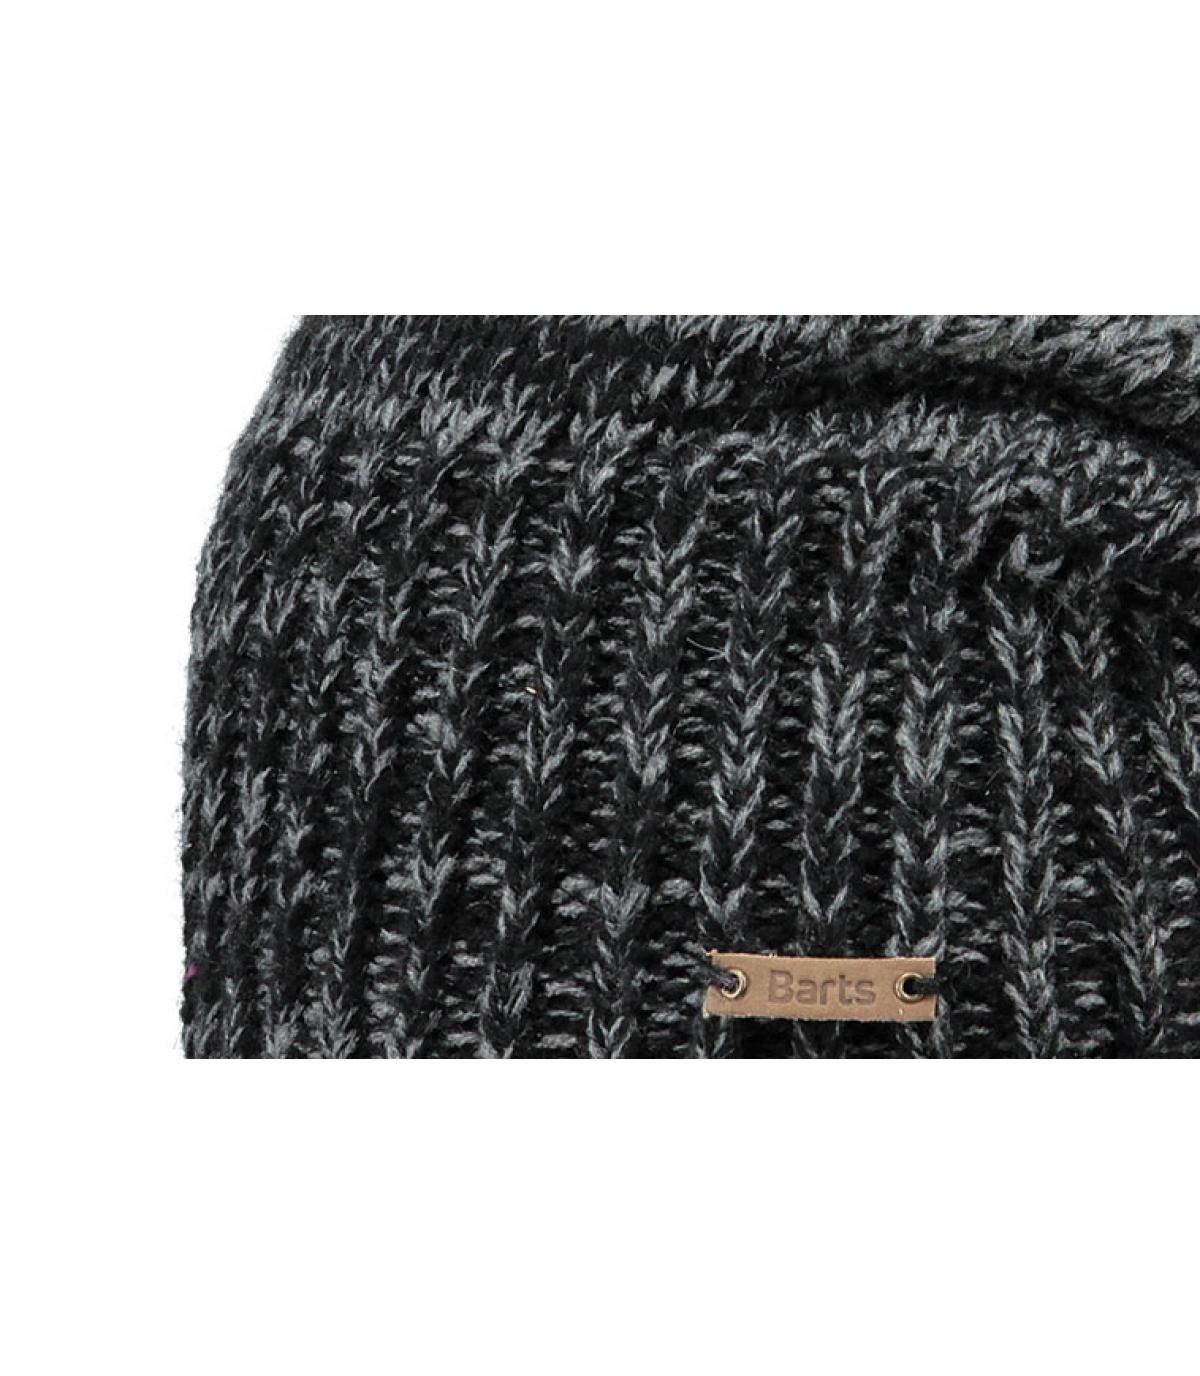 Black oversize beanie - Brighton beanie black by Barts. bf4c5b372c1